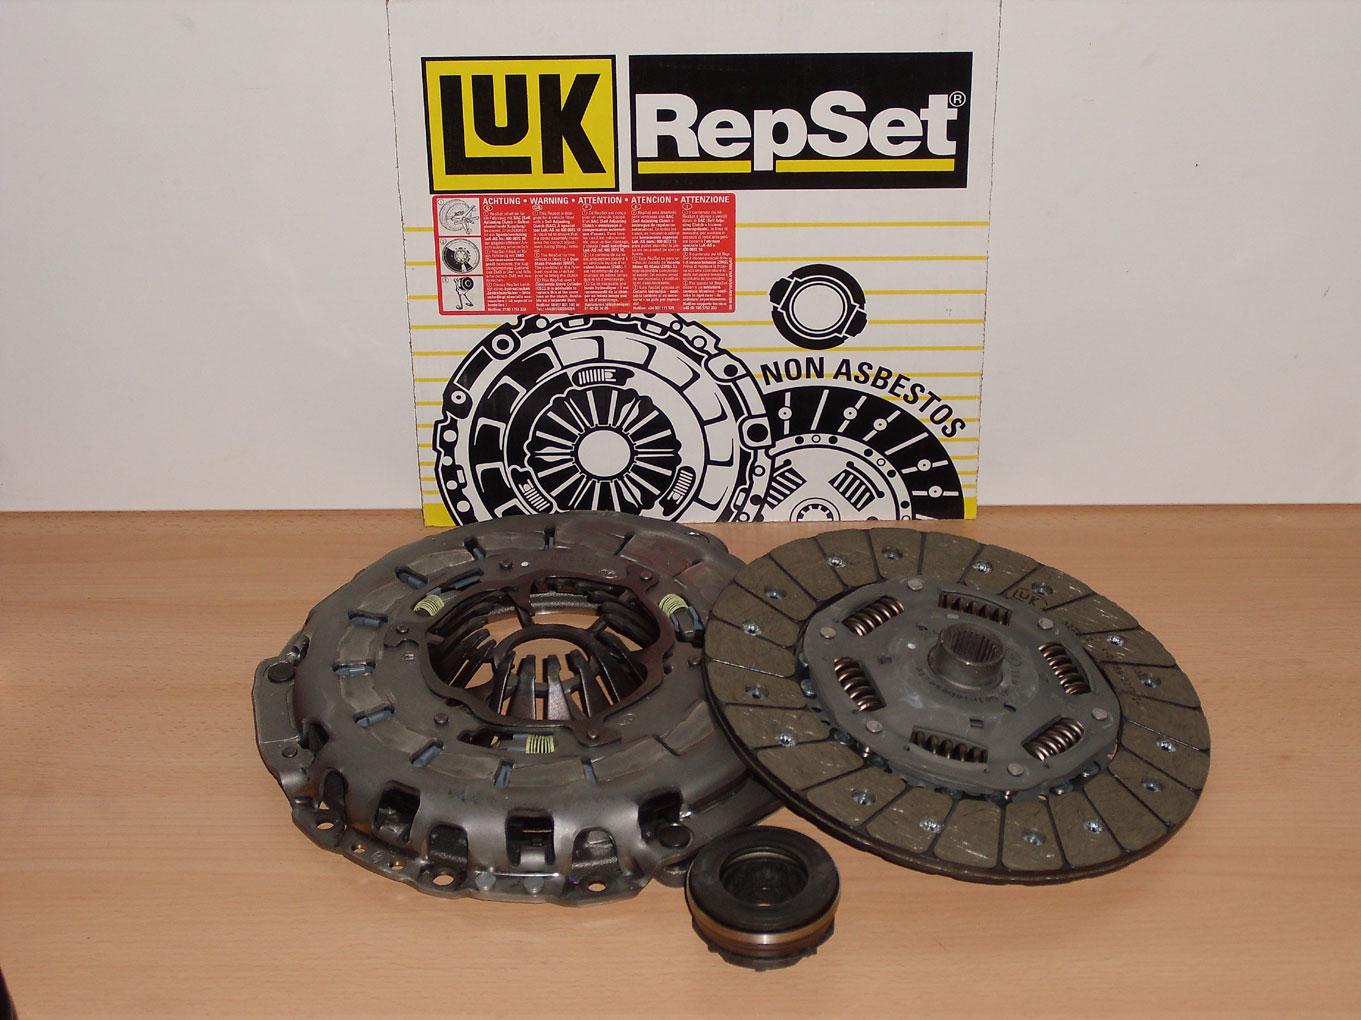 audi rs4 b5 2 7t bi turbo asj azr kupplung luk kupplung. Black Bedroom Furniture Sets. Home Design Ideas